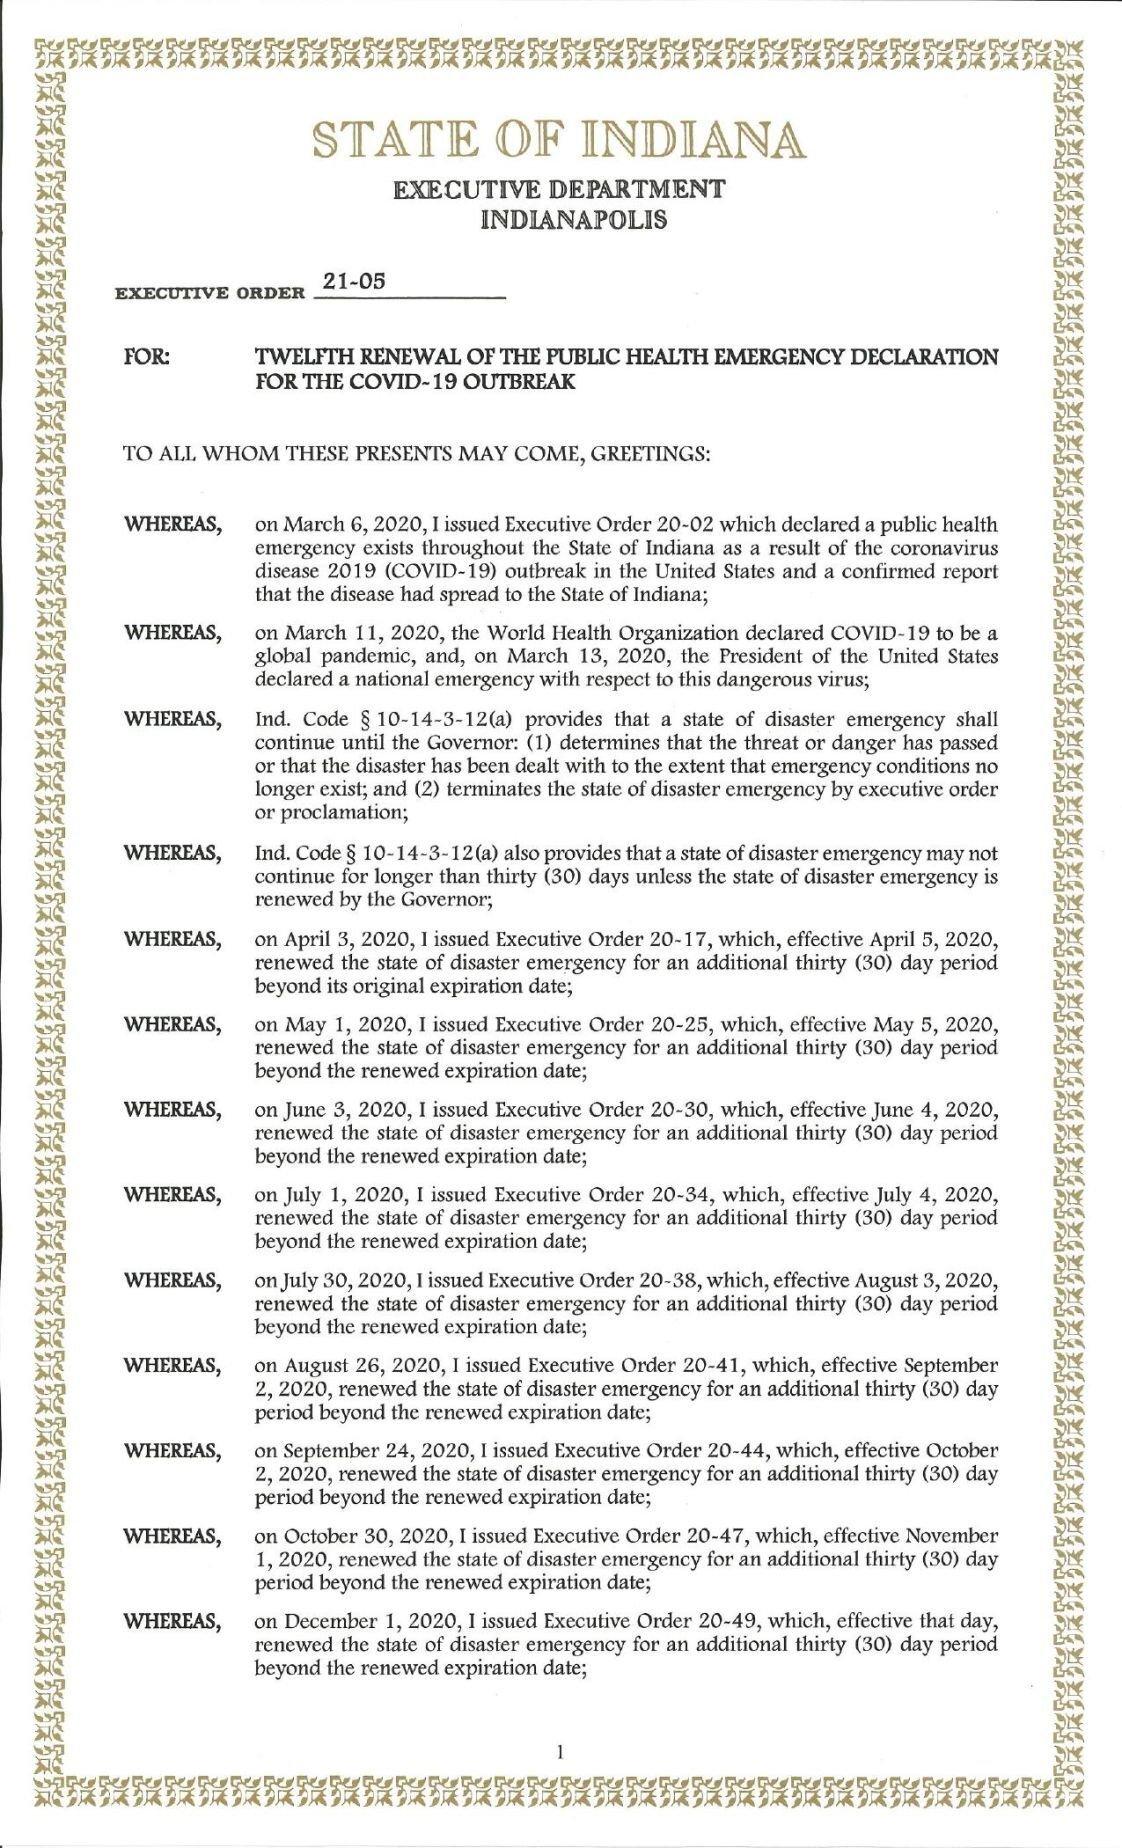 Gov. Eric Holcomb Executive Order 21-05